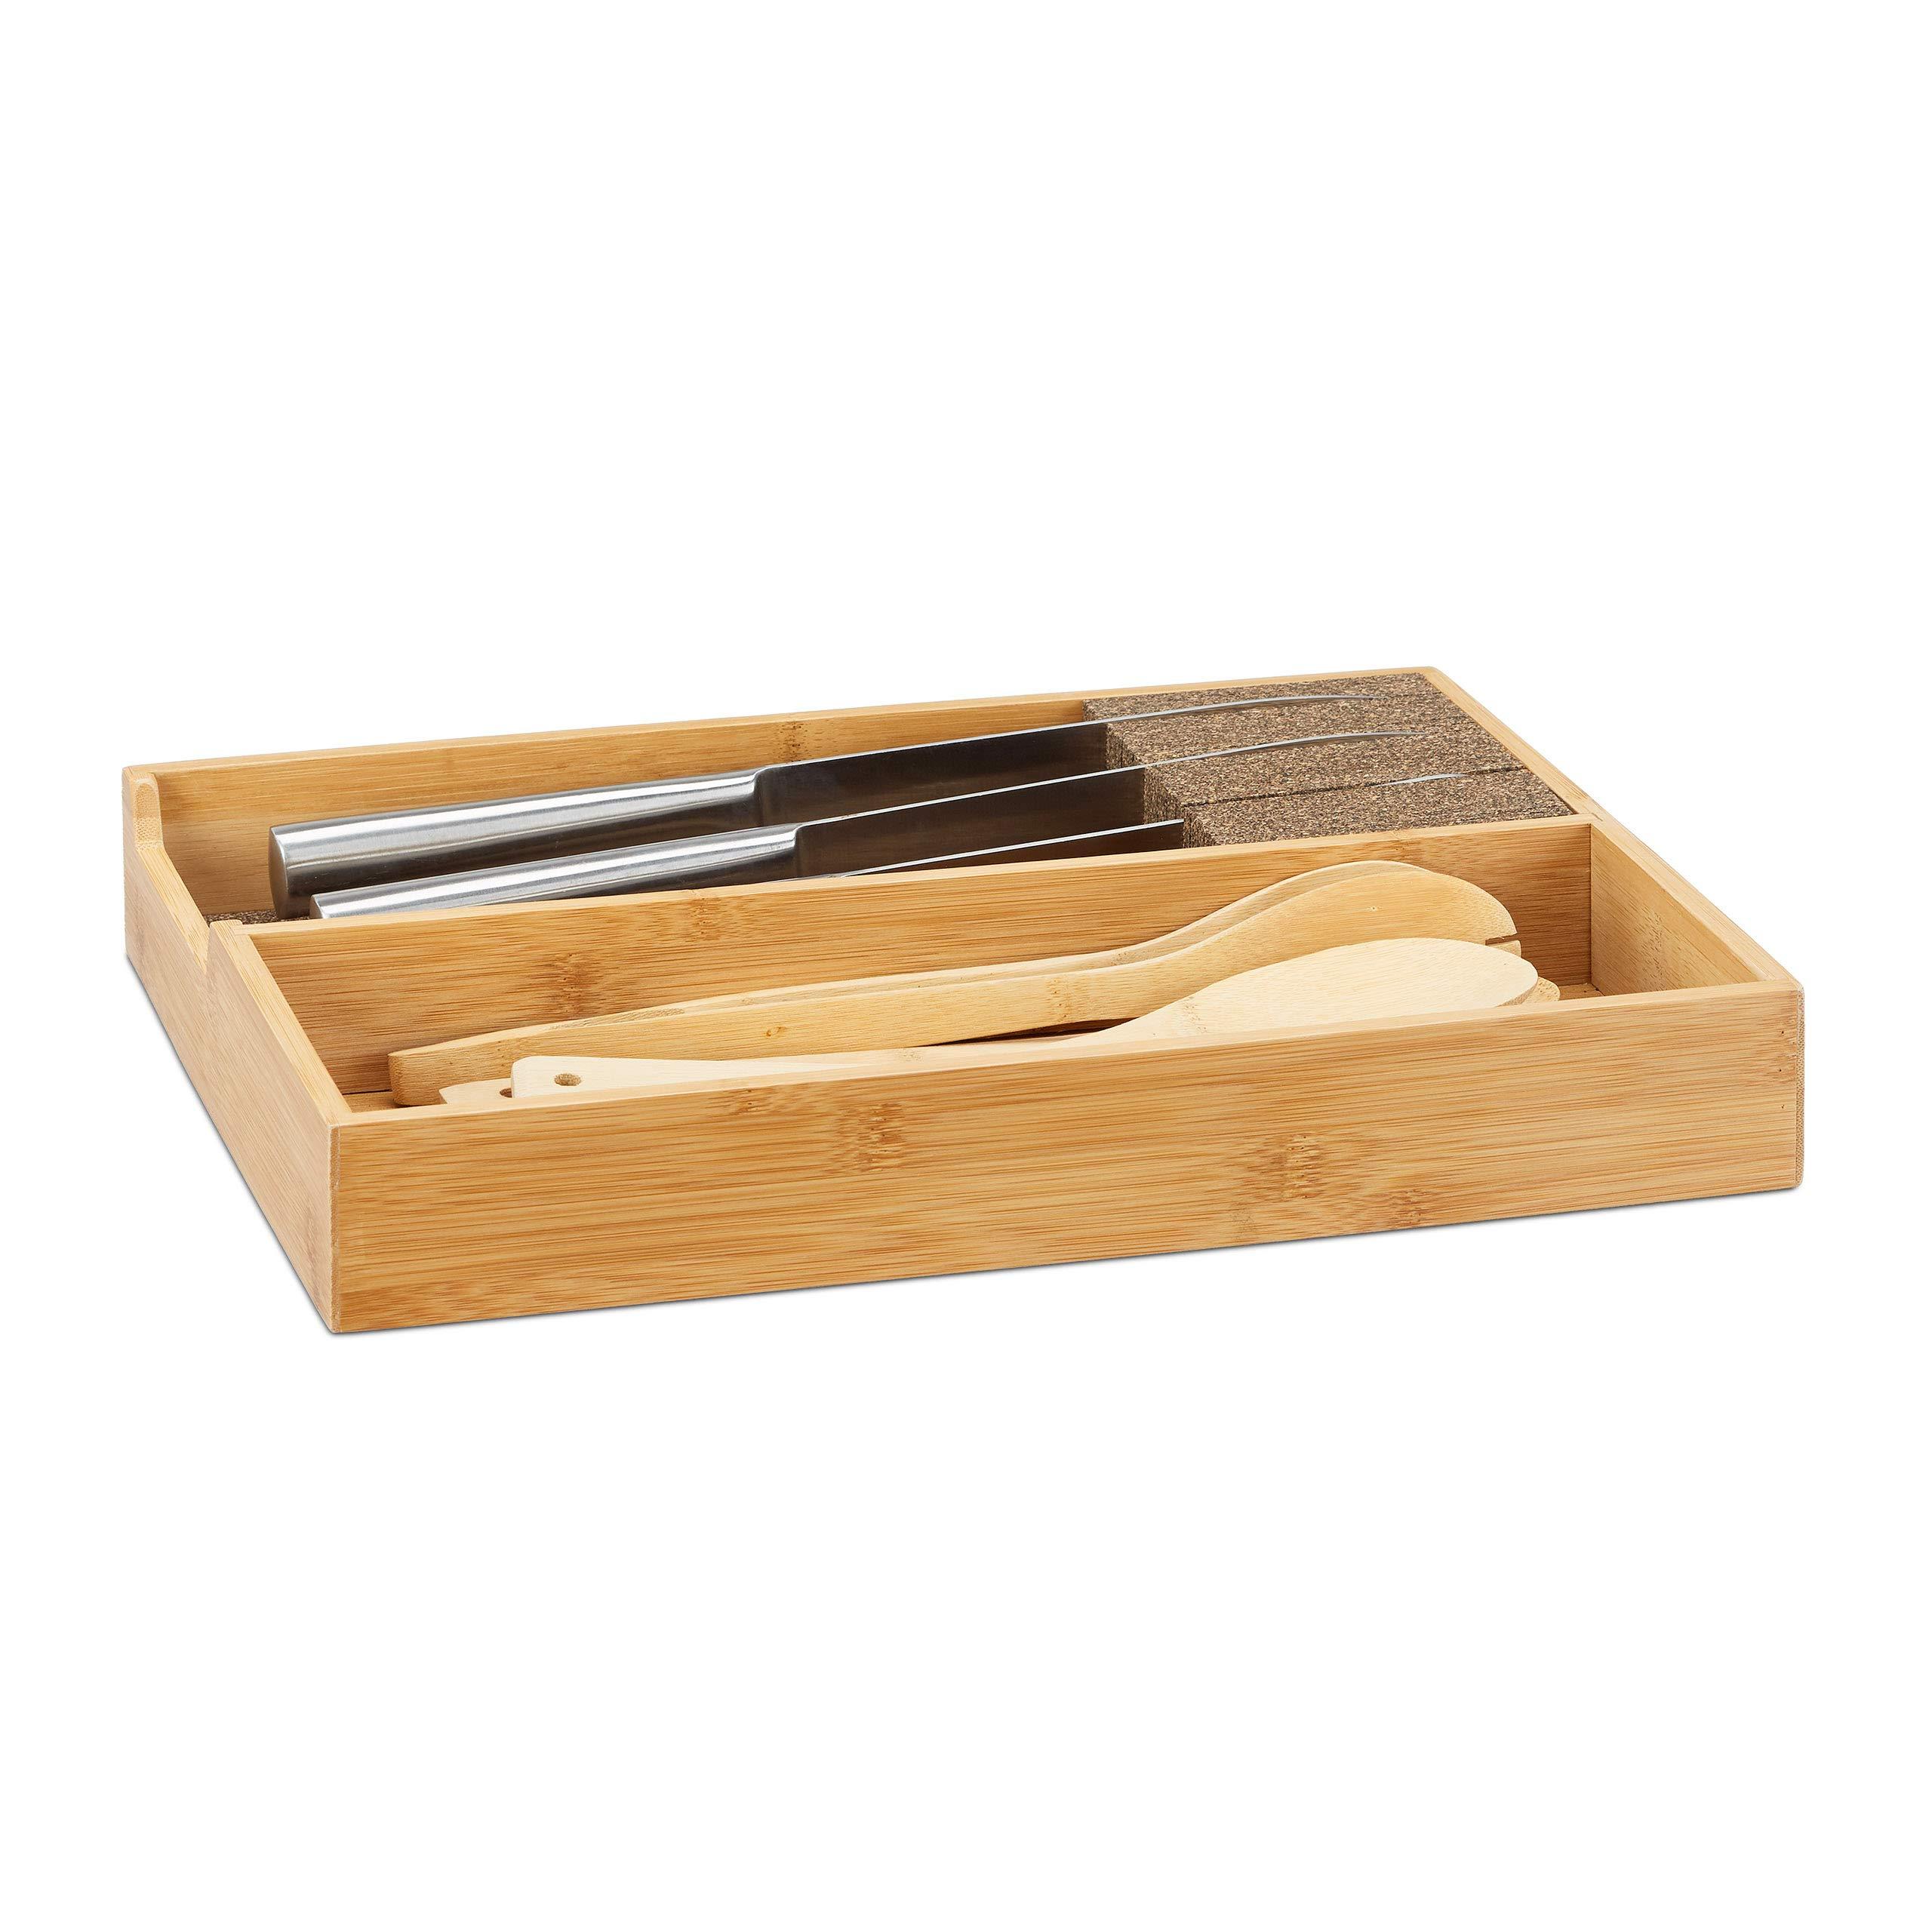 Relaxdays Bamboo Knife Holder, Drawer & Messe Storage Tray Drawer Organizer (H x W: 6,5x38x30cm, Natural